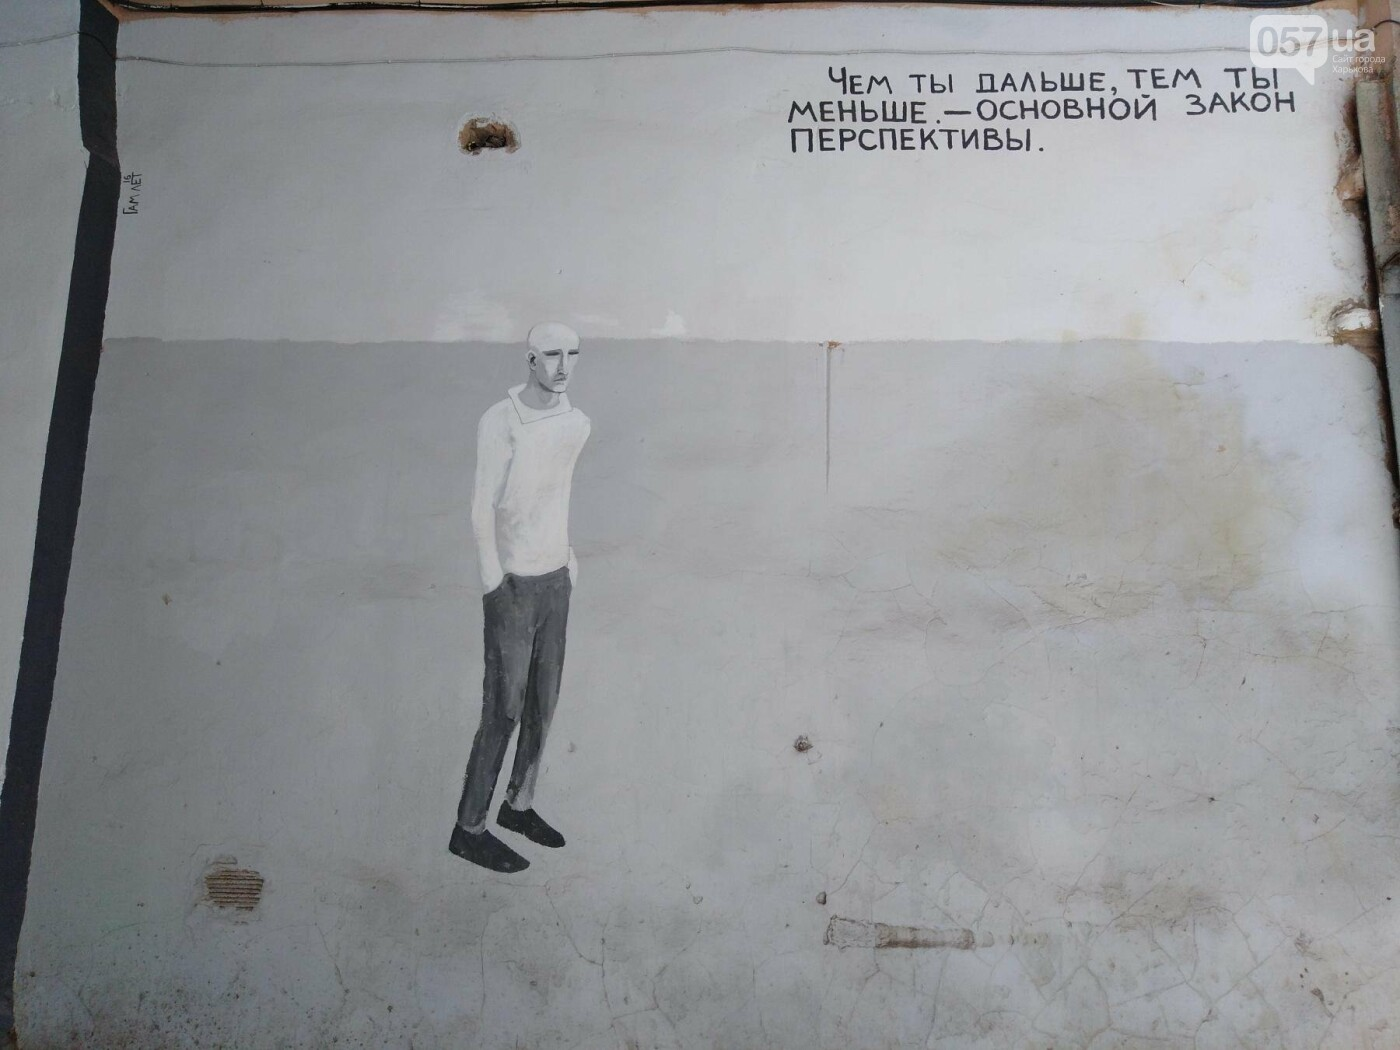 Стрит-арт Гамлета в Харькове: ТОП-10 граффити художника, - ФОТО, фото-8